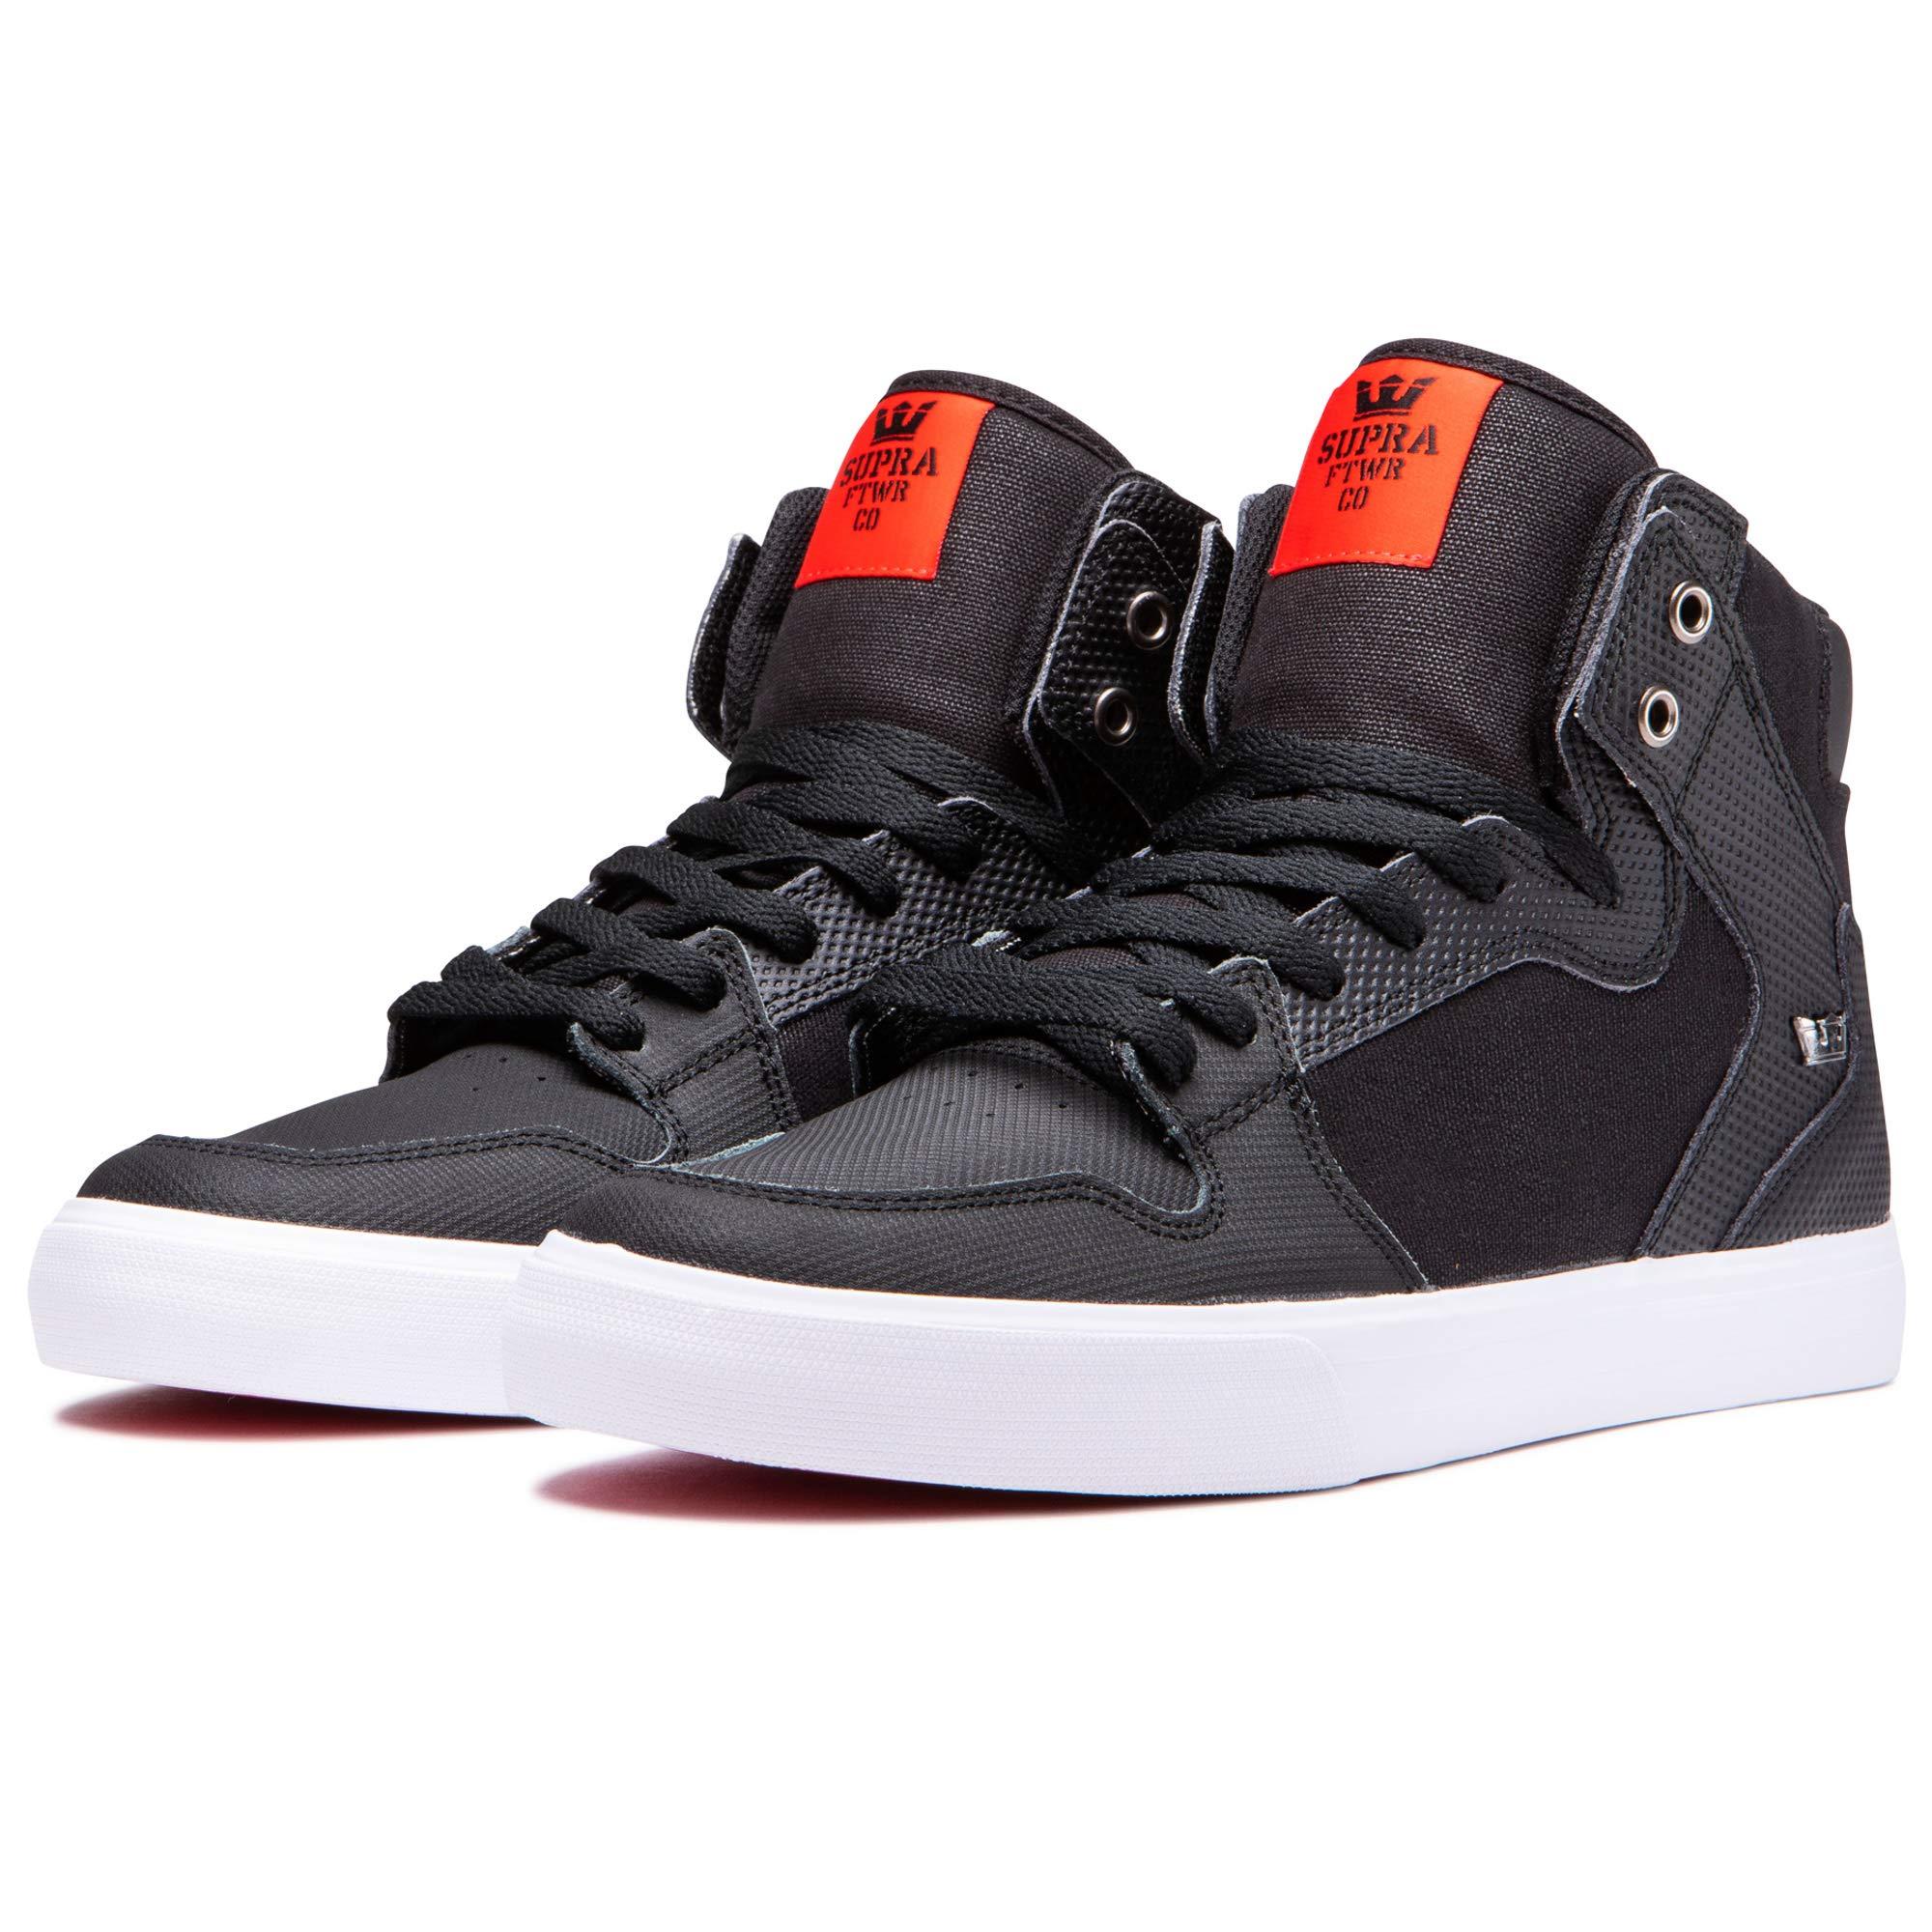 Supra Footwear - Vaider High Top Skate Shoes, Black Tuf-White, 9 M US Women/7.5 M US Men by Supra